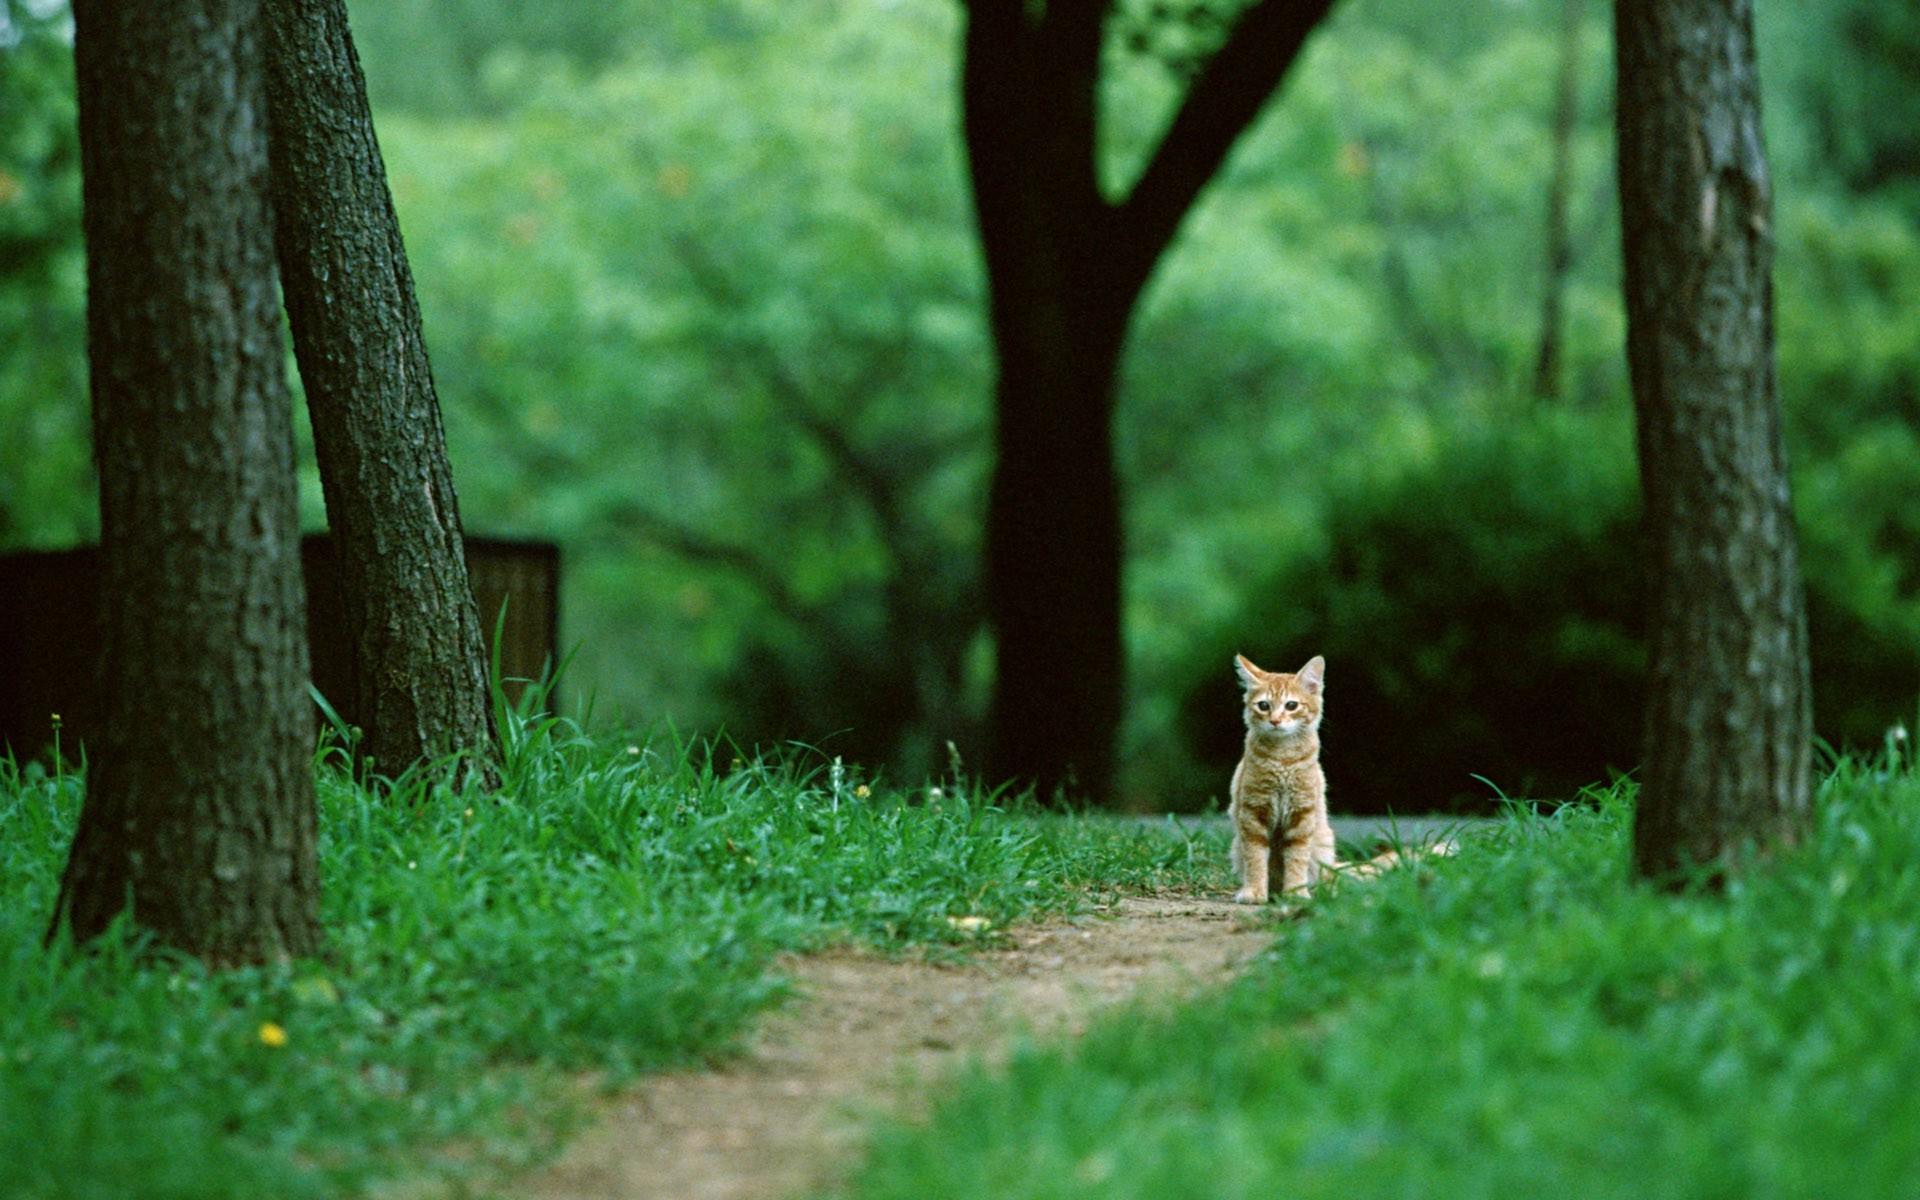 1920x1200 Px Animals Cats Feline Grass Green Nature Park Trees